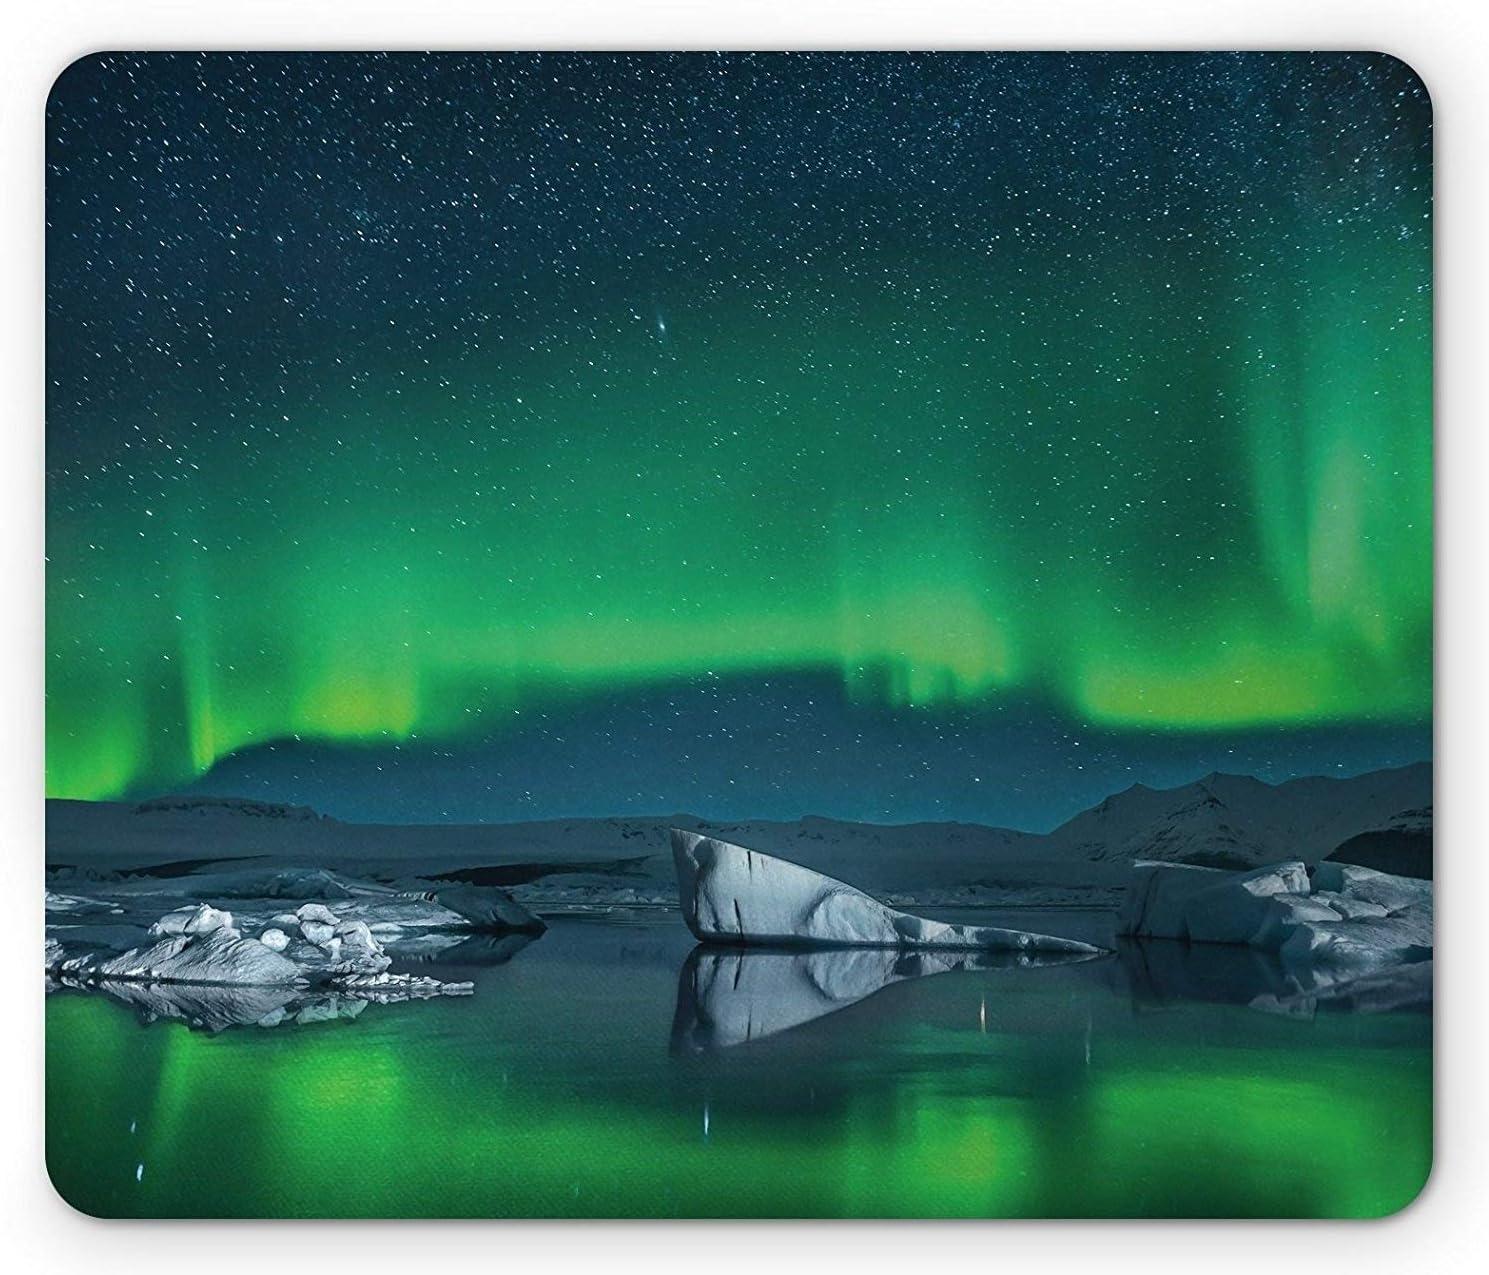 Green Space Aurora Borealis Festival mousepad